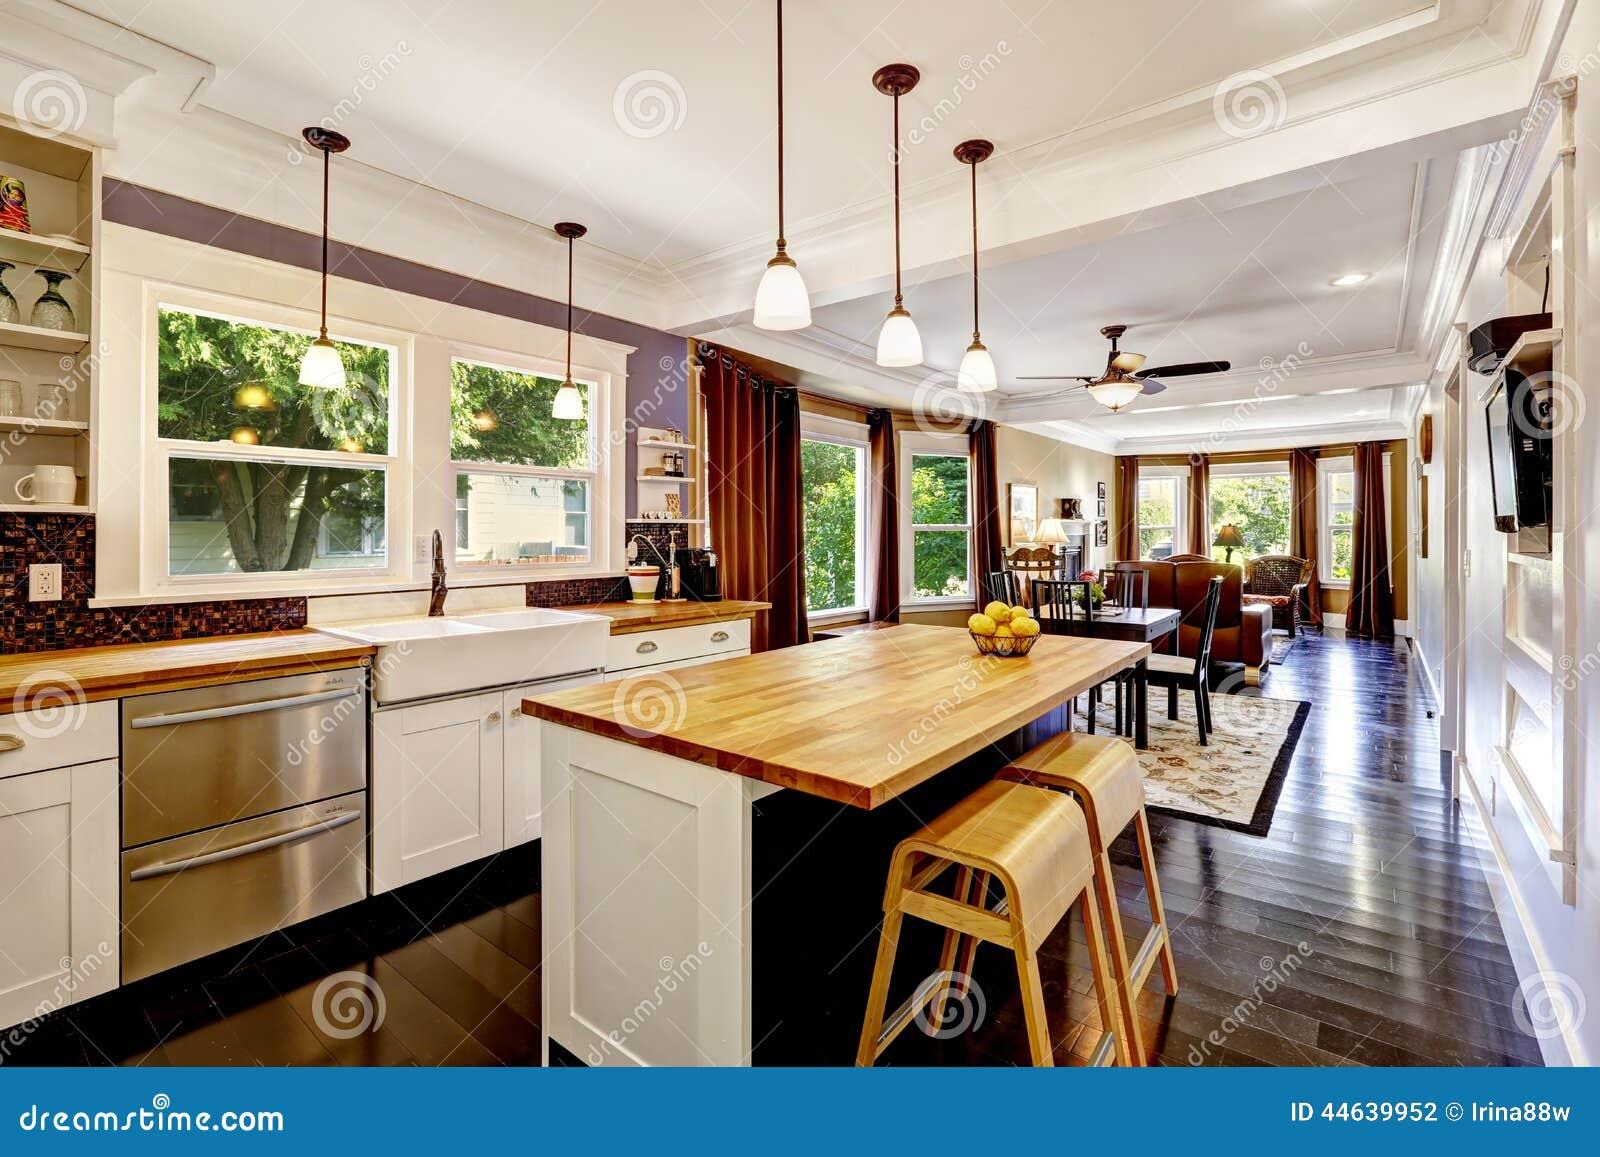 Favoloso Cucina Con Disegni | madgeweb.com idee di interior design KU75